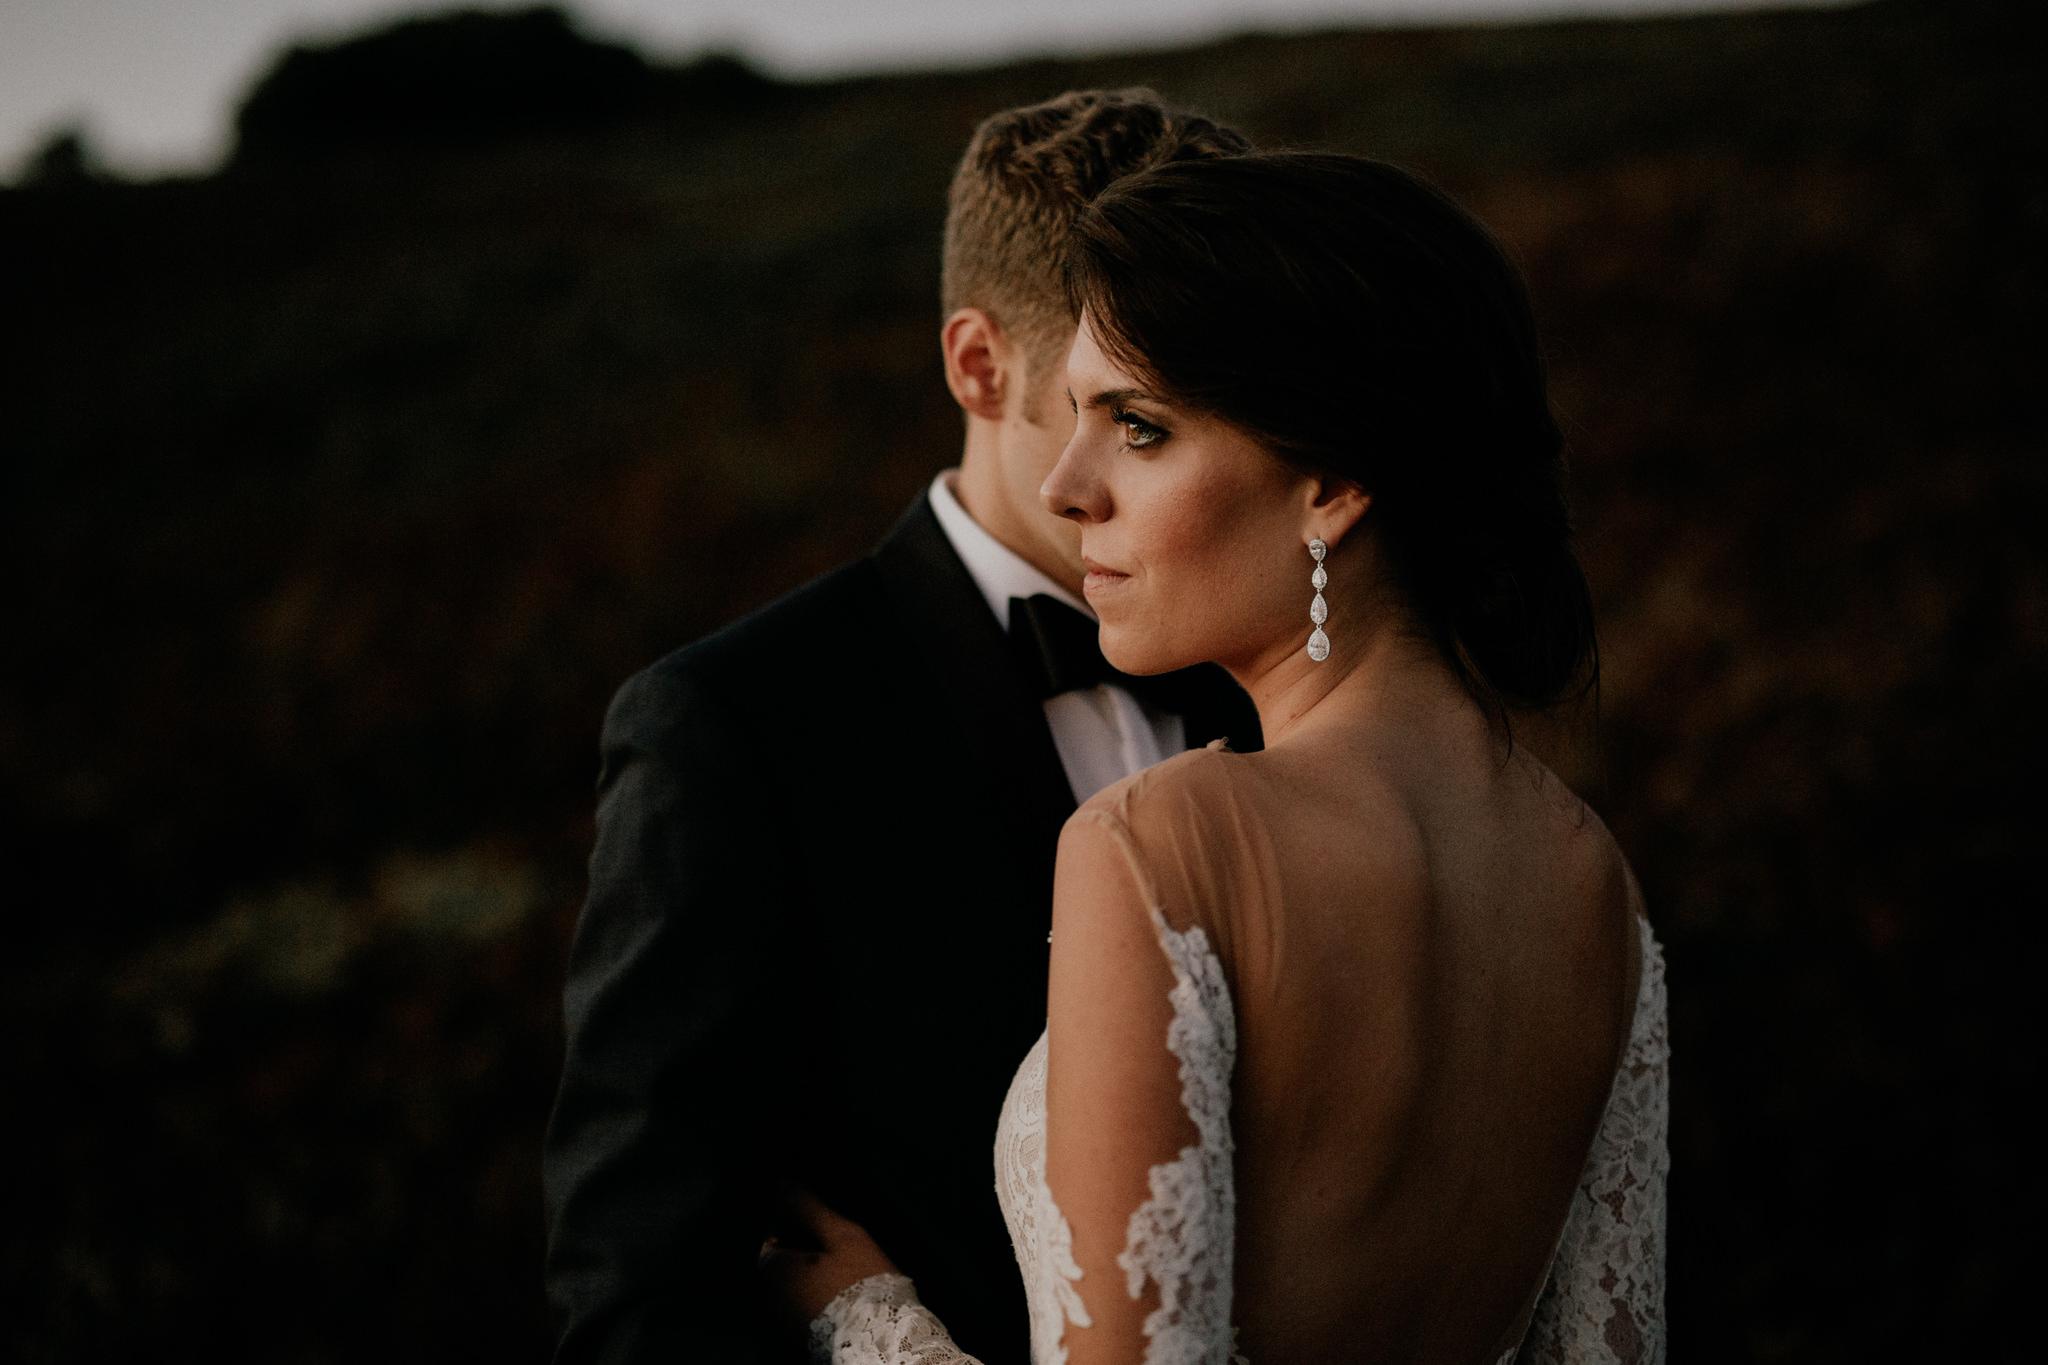 wedding-headlands-center-for-the-arts-sausalito-122.jpg